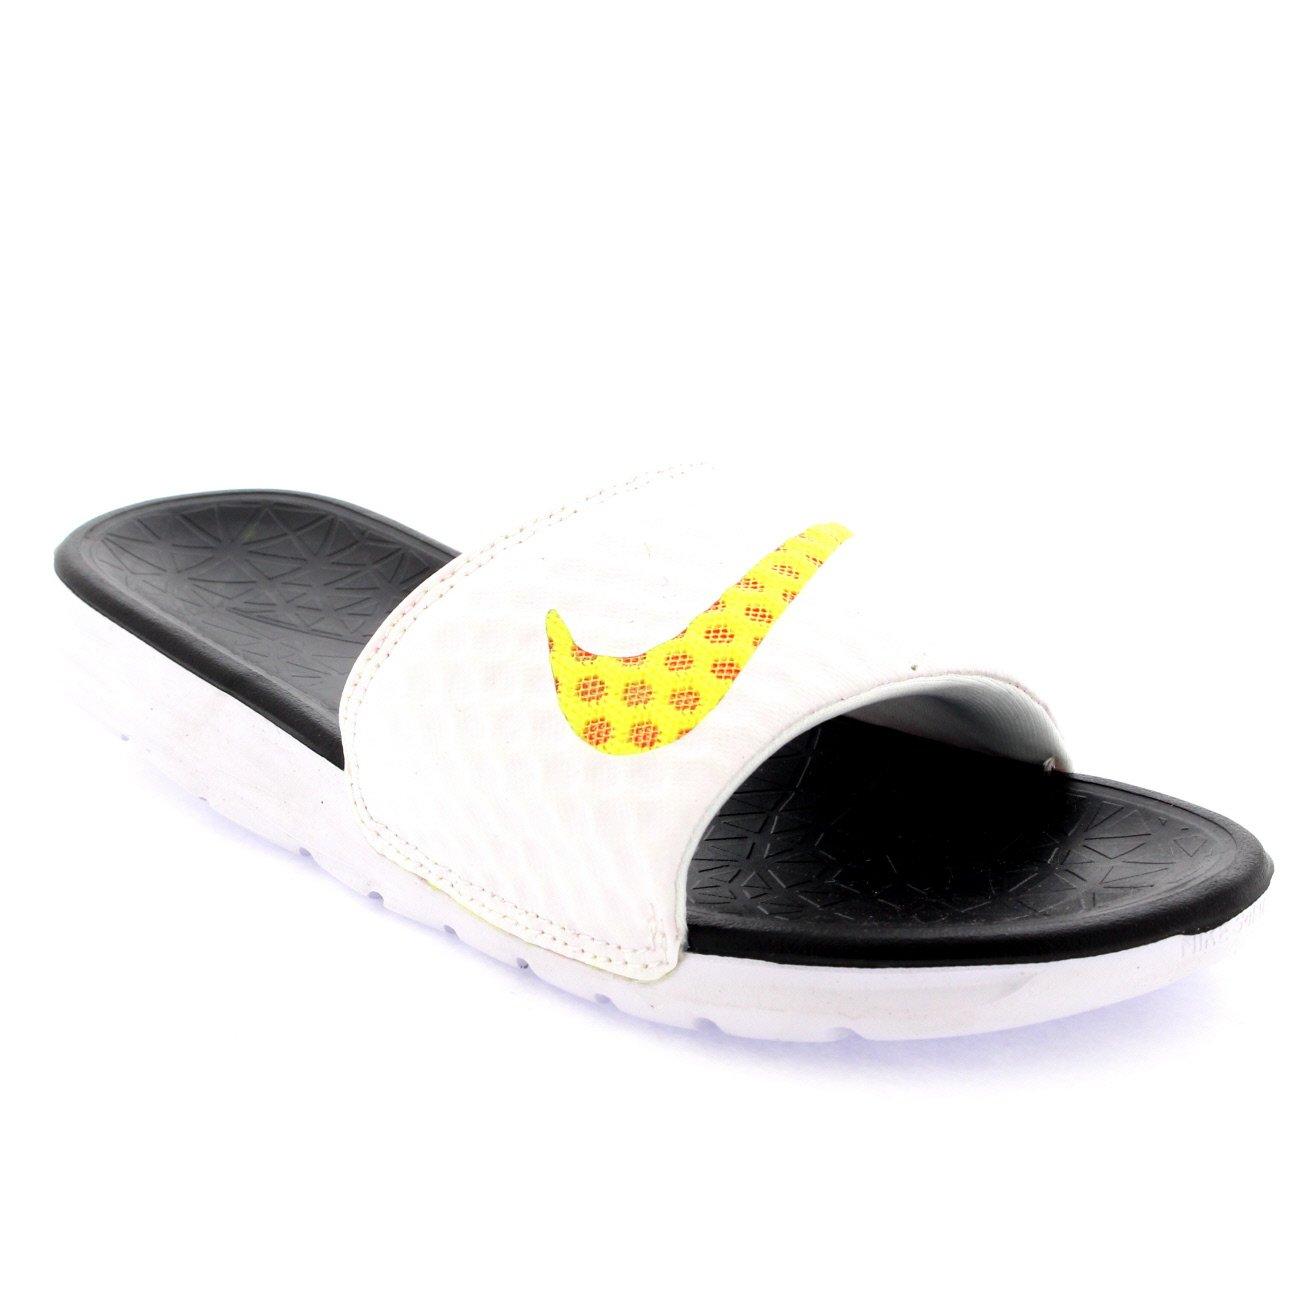 best loved aff58 8c520 Nike Unisex Adults Benassi Solarsoft Slide 2 Sliders Beach Sandals -  White Black - 10  Amazon.co.uk  Shoes   Bags